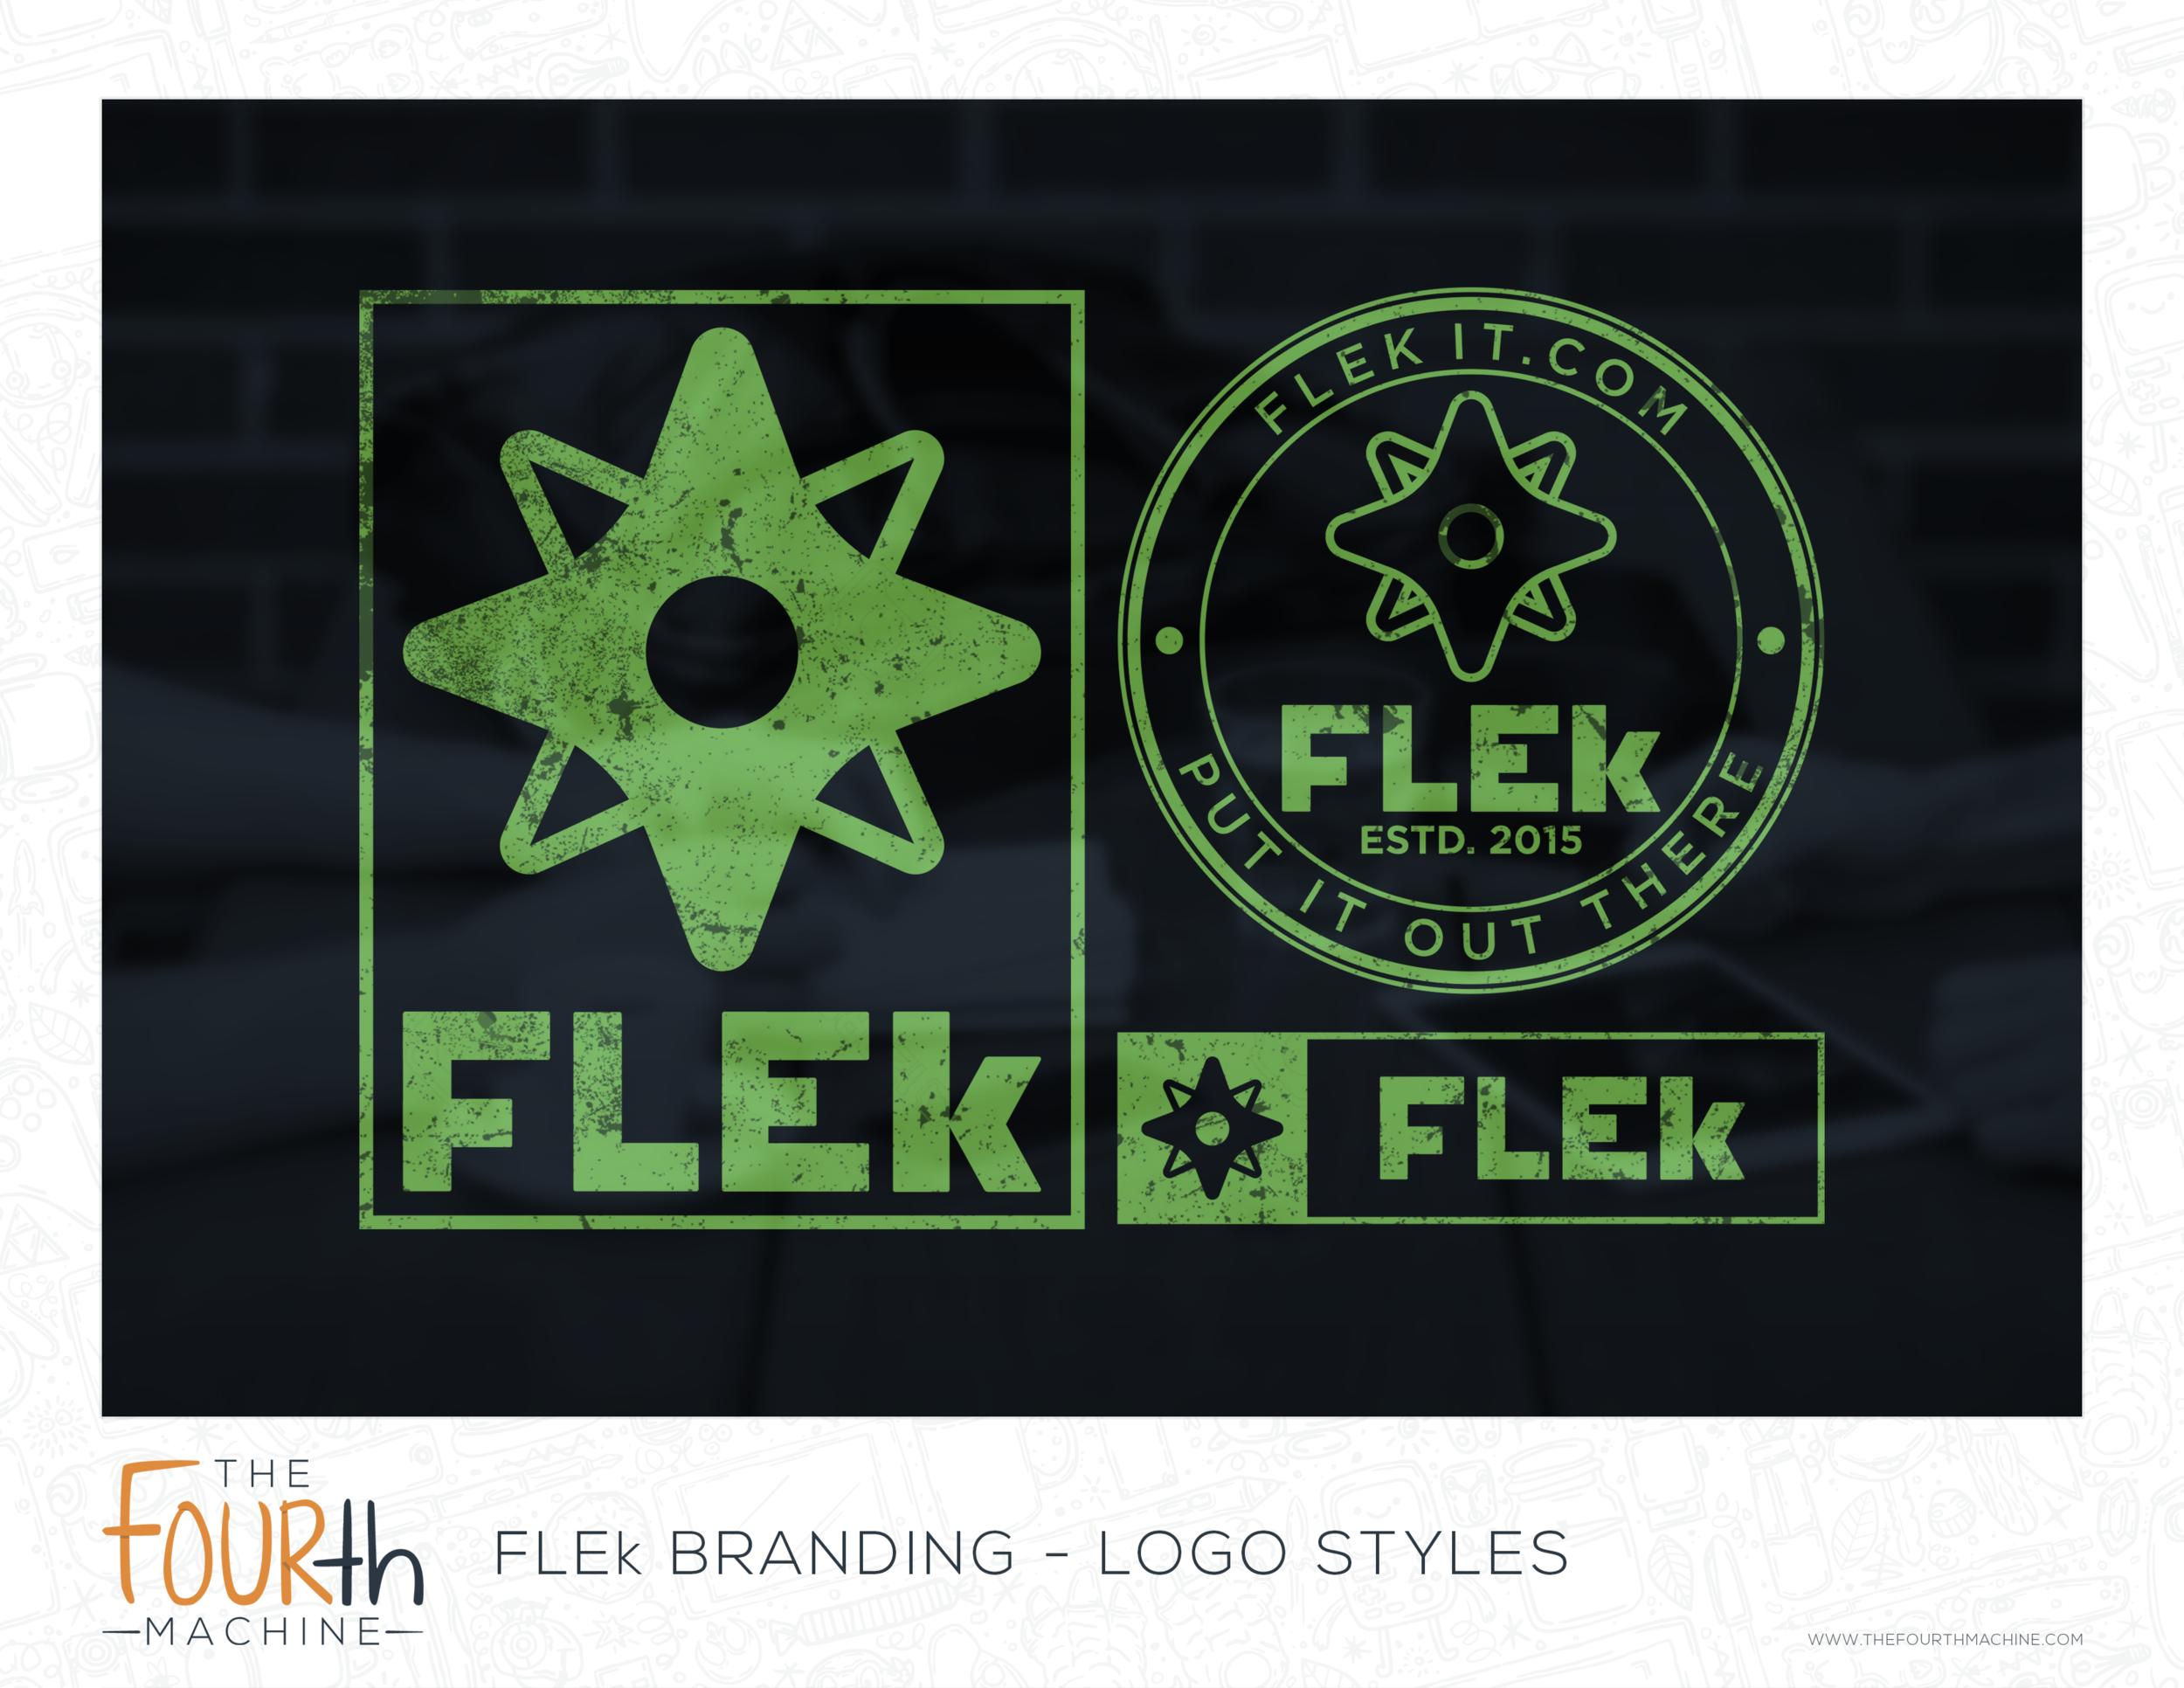 FLEk_Branding_Logo_Styles.png